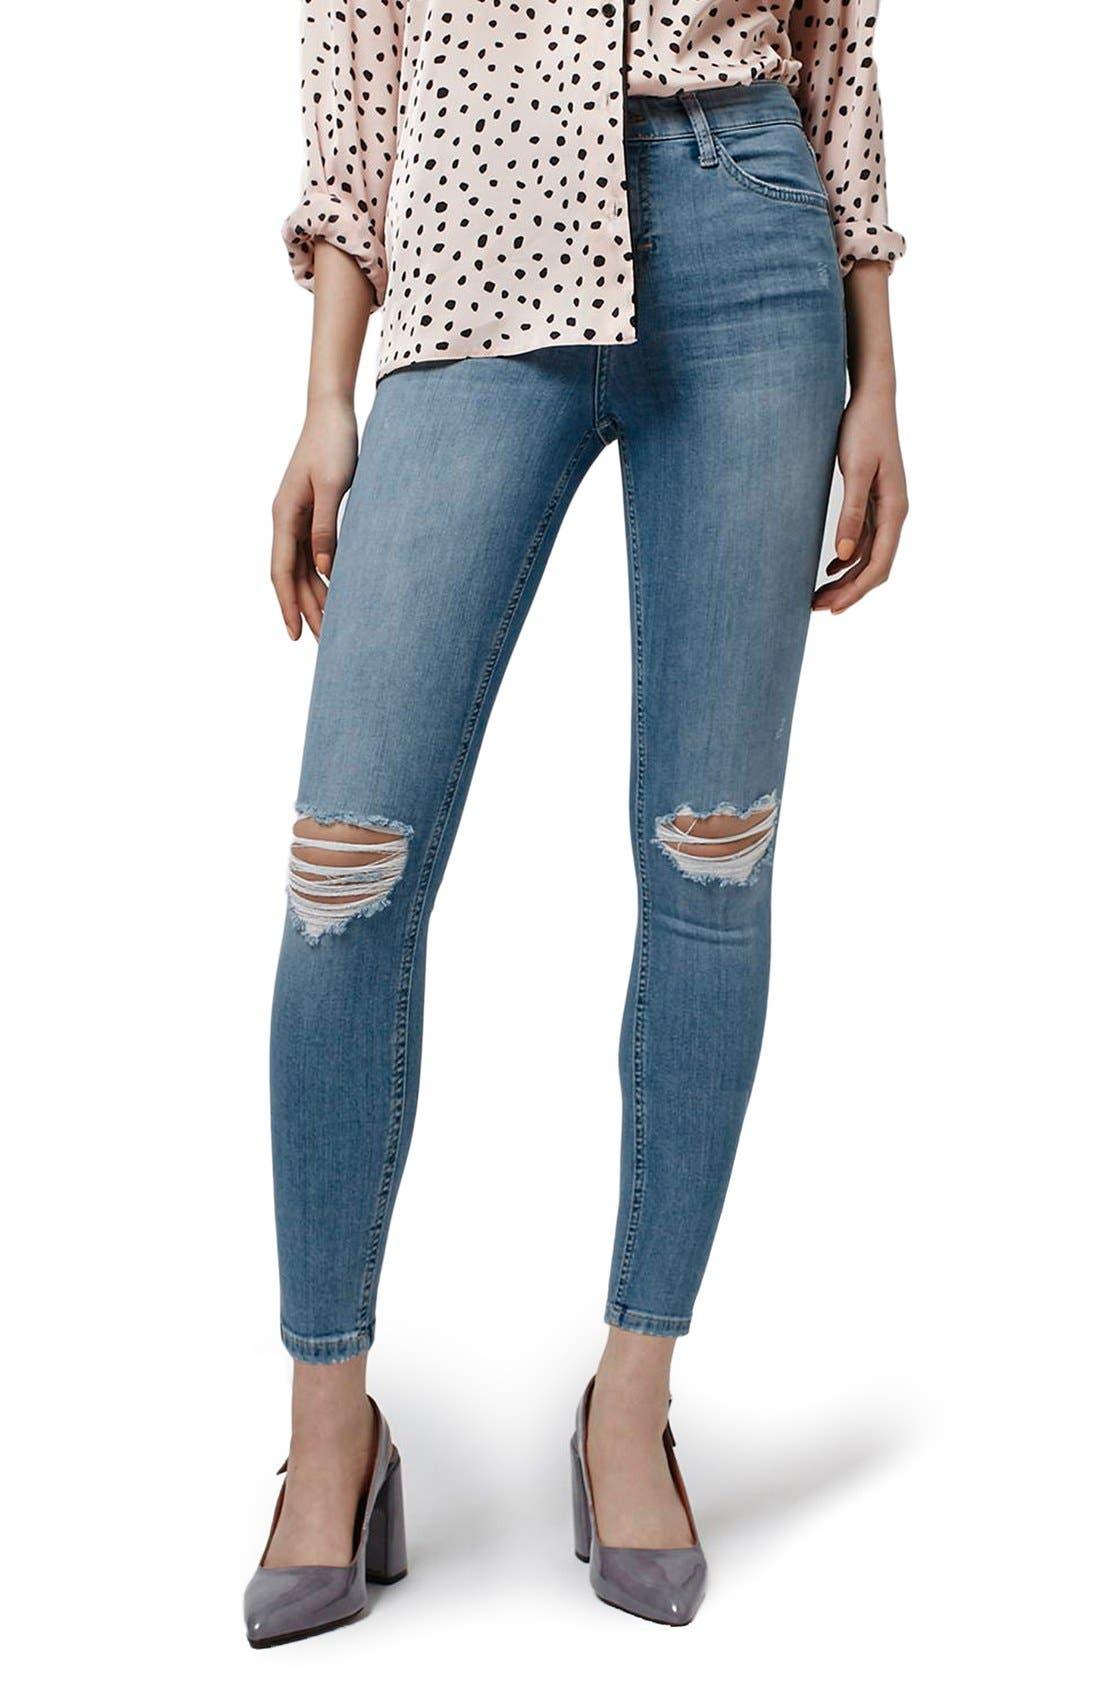 Main Image - Topshop 'Jamie' Distressed Skinny Jeans (Petite)